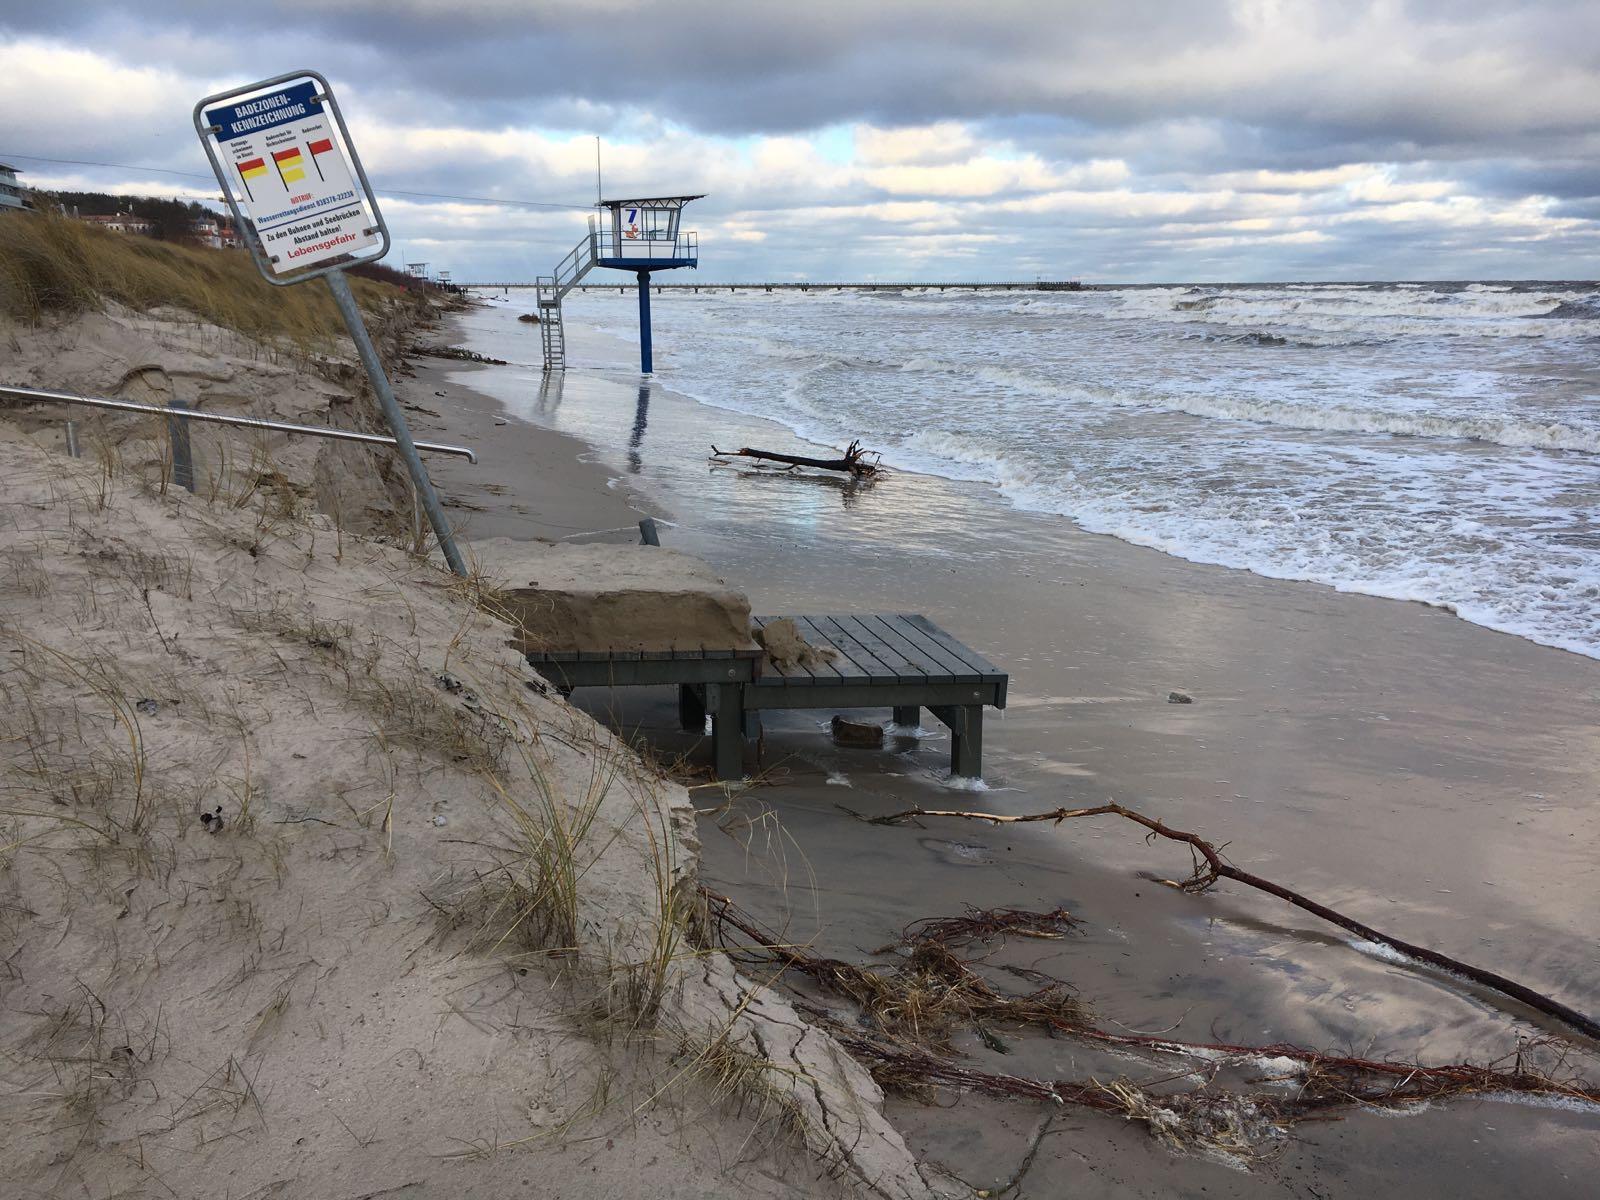 Strandaufgang Insel Usedom Ahlbeck Heringsdorf Bansin Sturmtief Axel Hochwasser Sturmflut